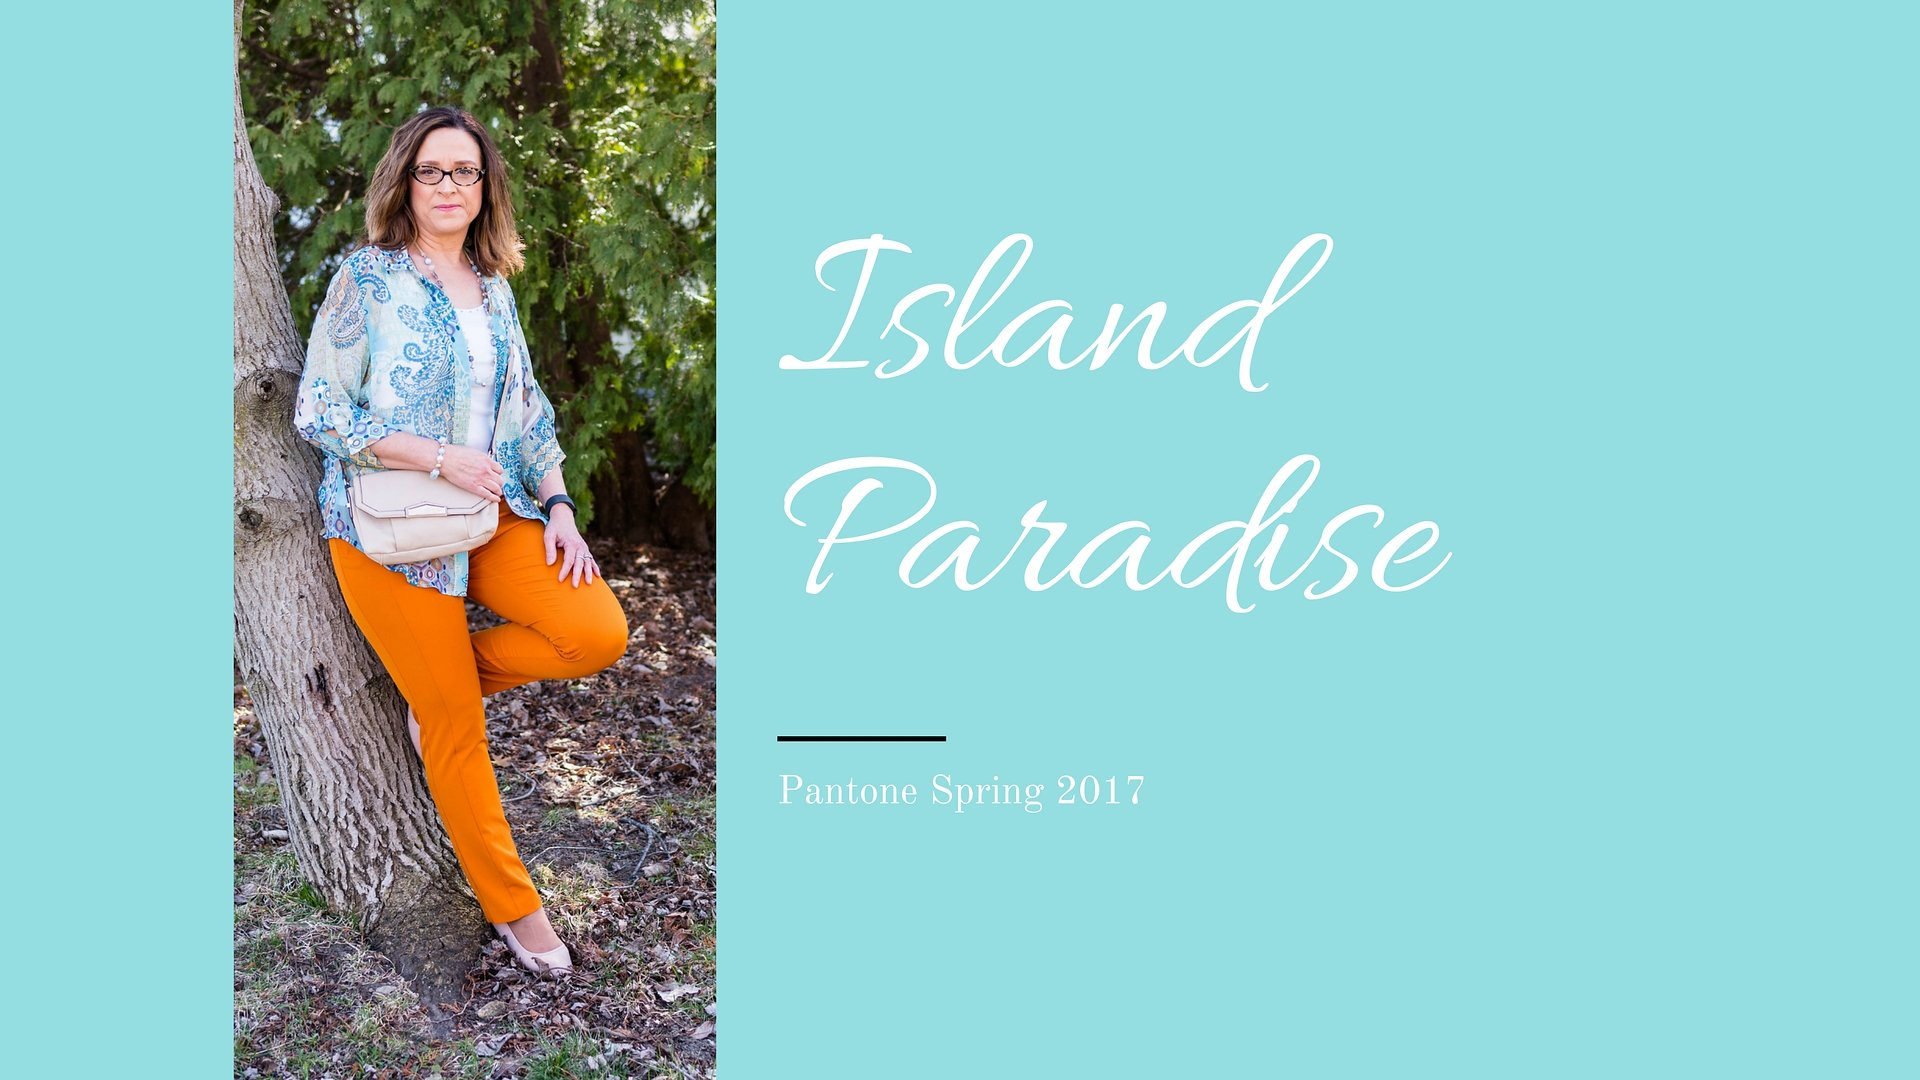 Pantone Spring 2017 - Island Paradise